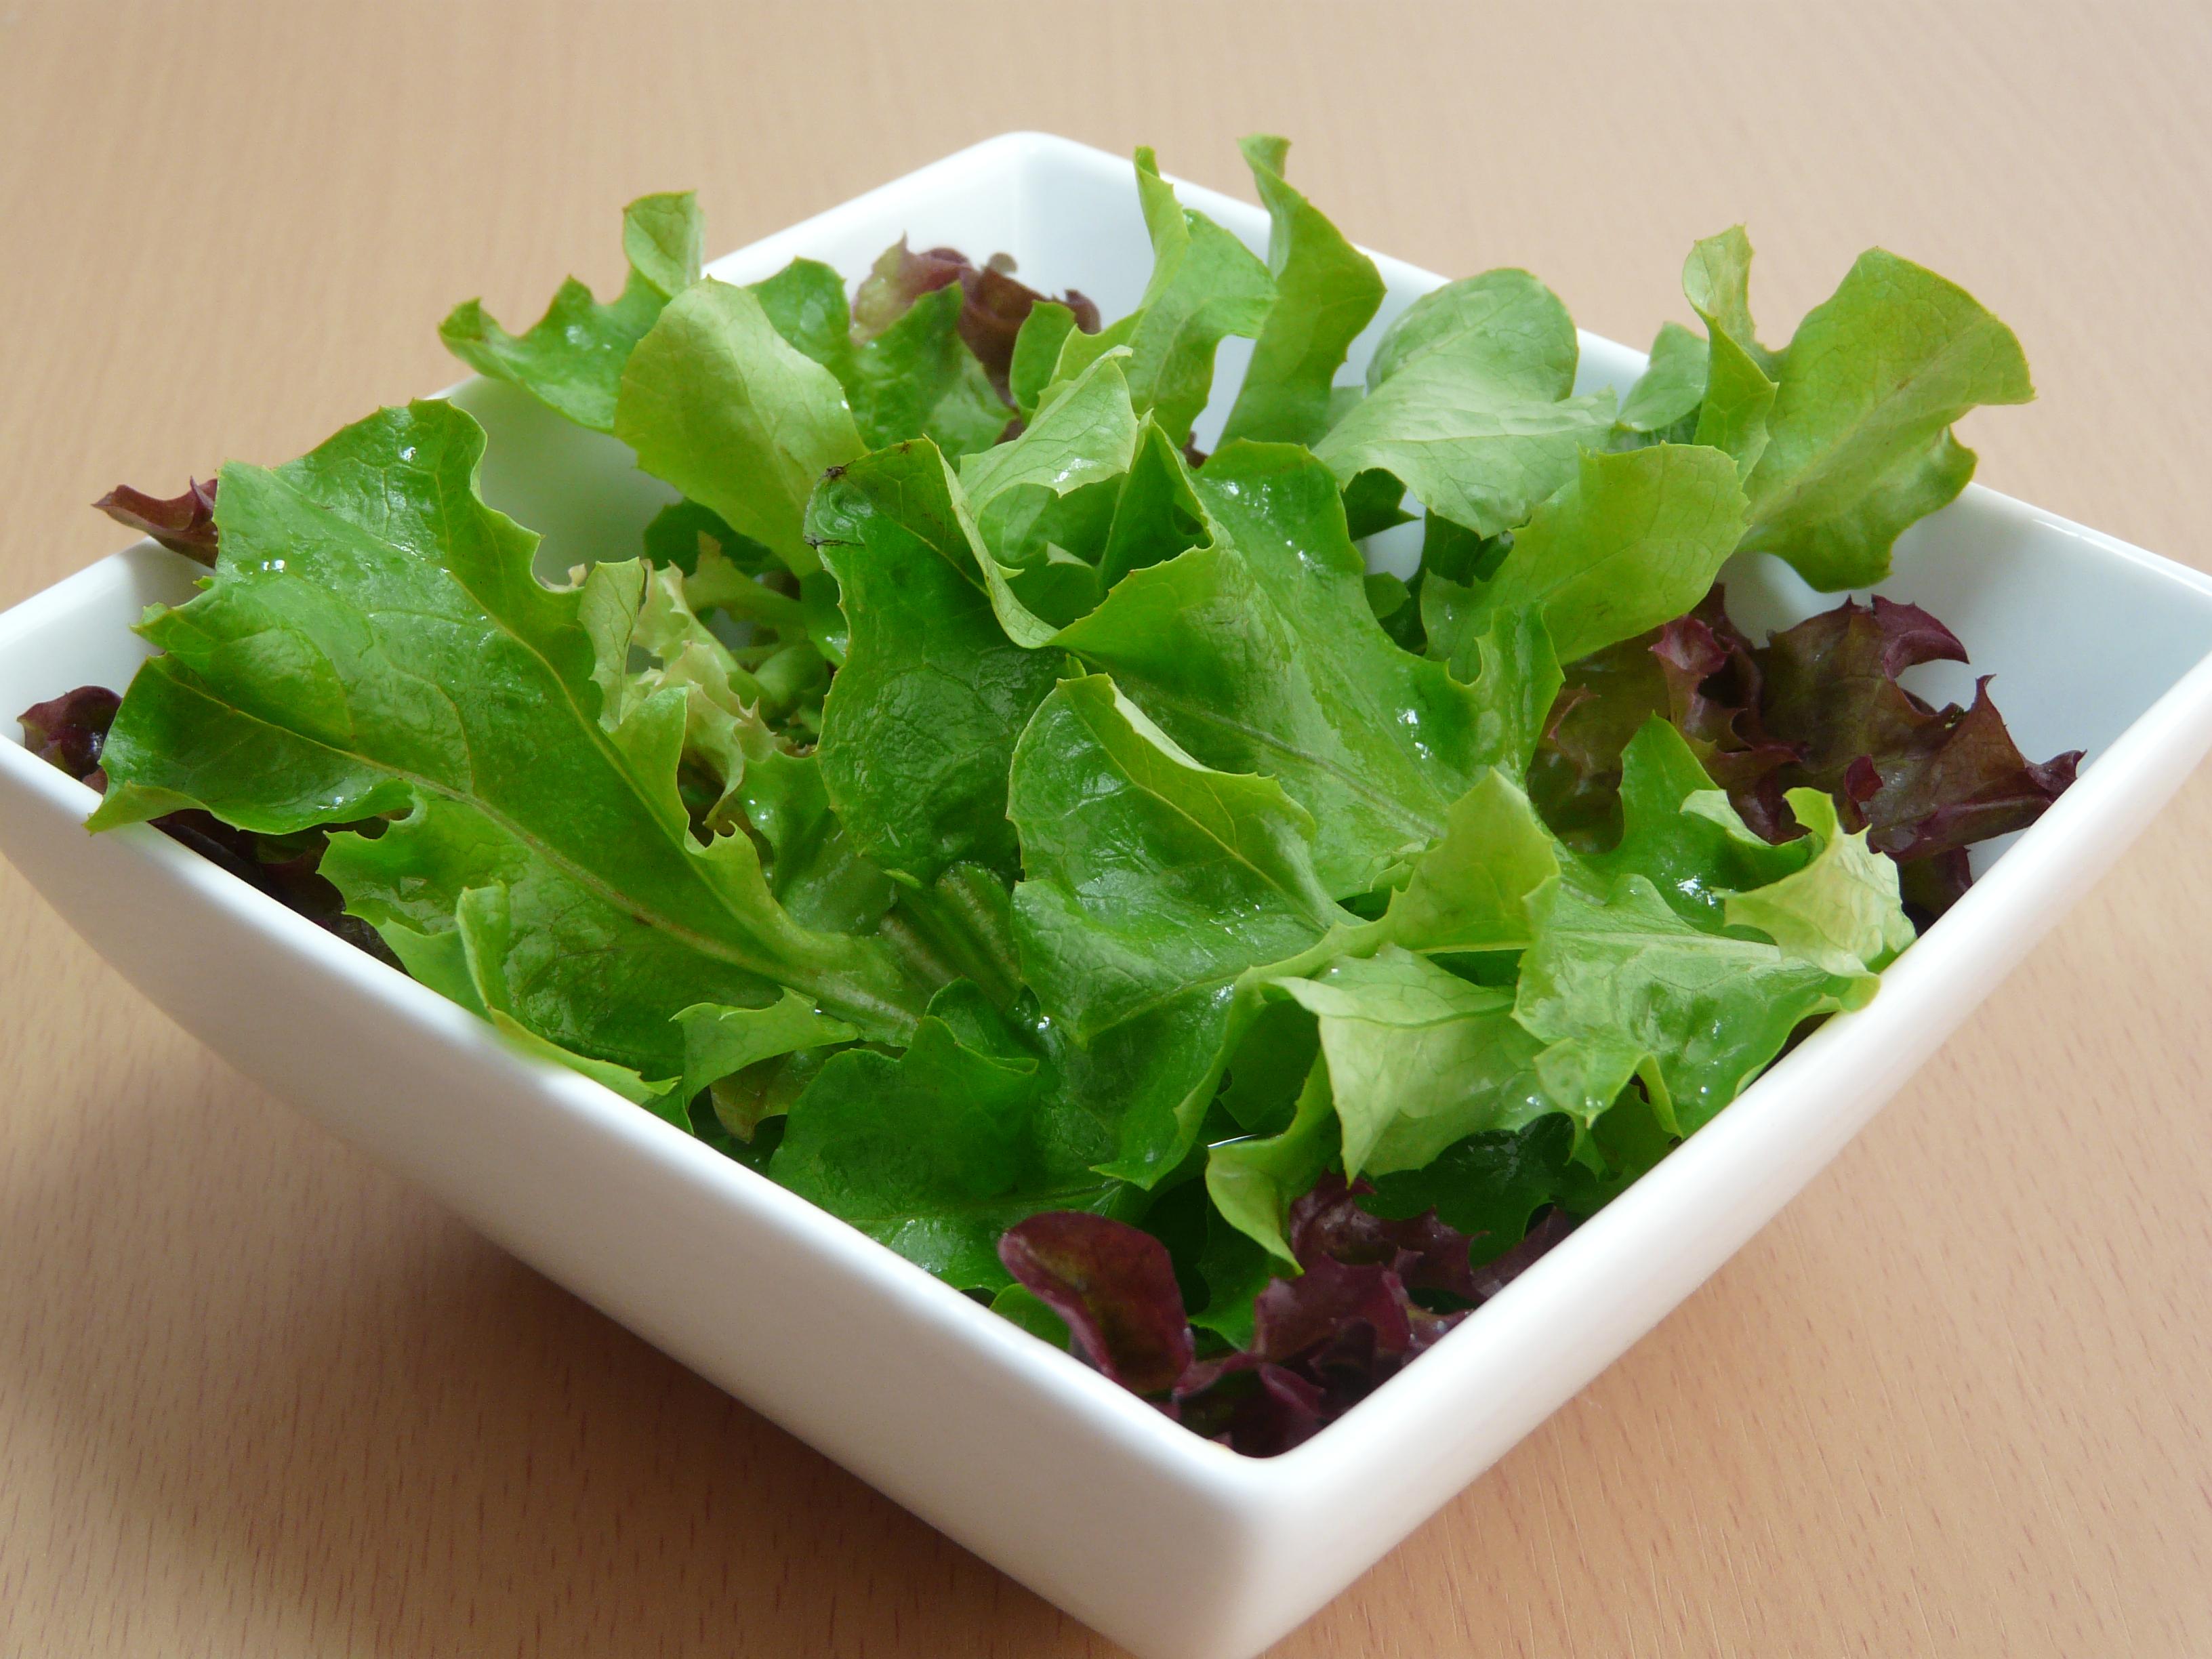 Using the HCG Diet as a Springboard Toward a Healthier Life